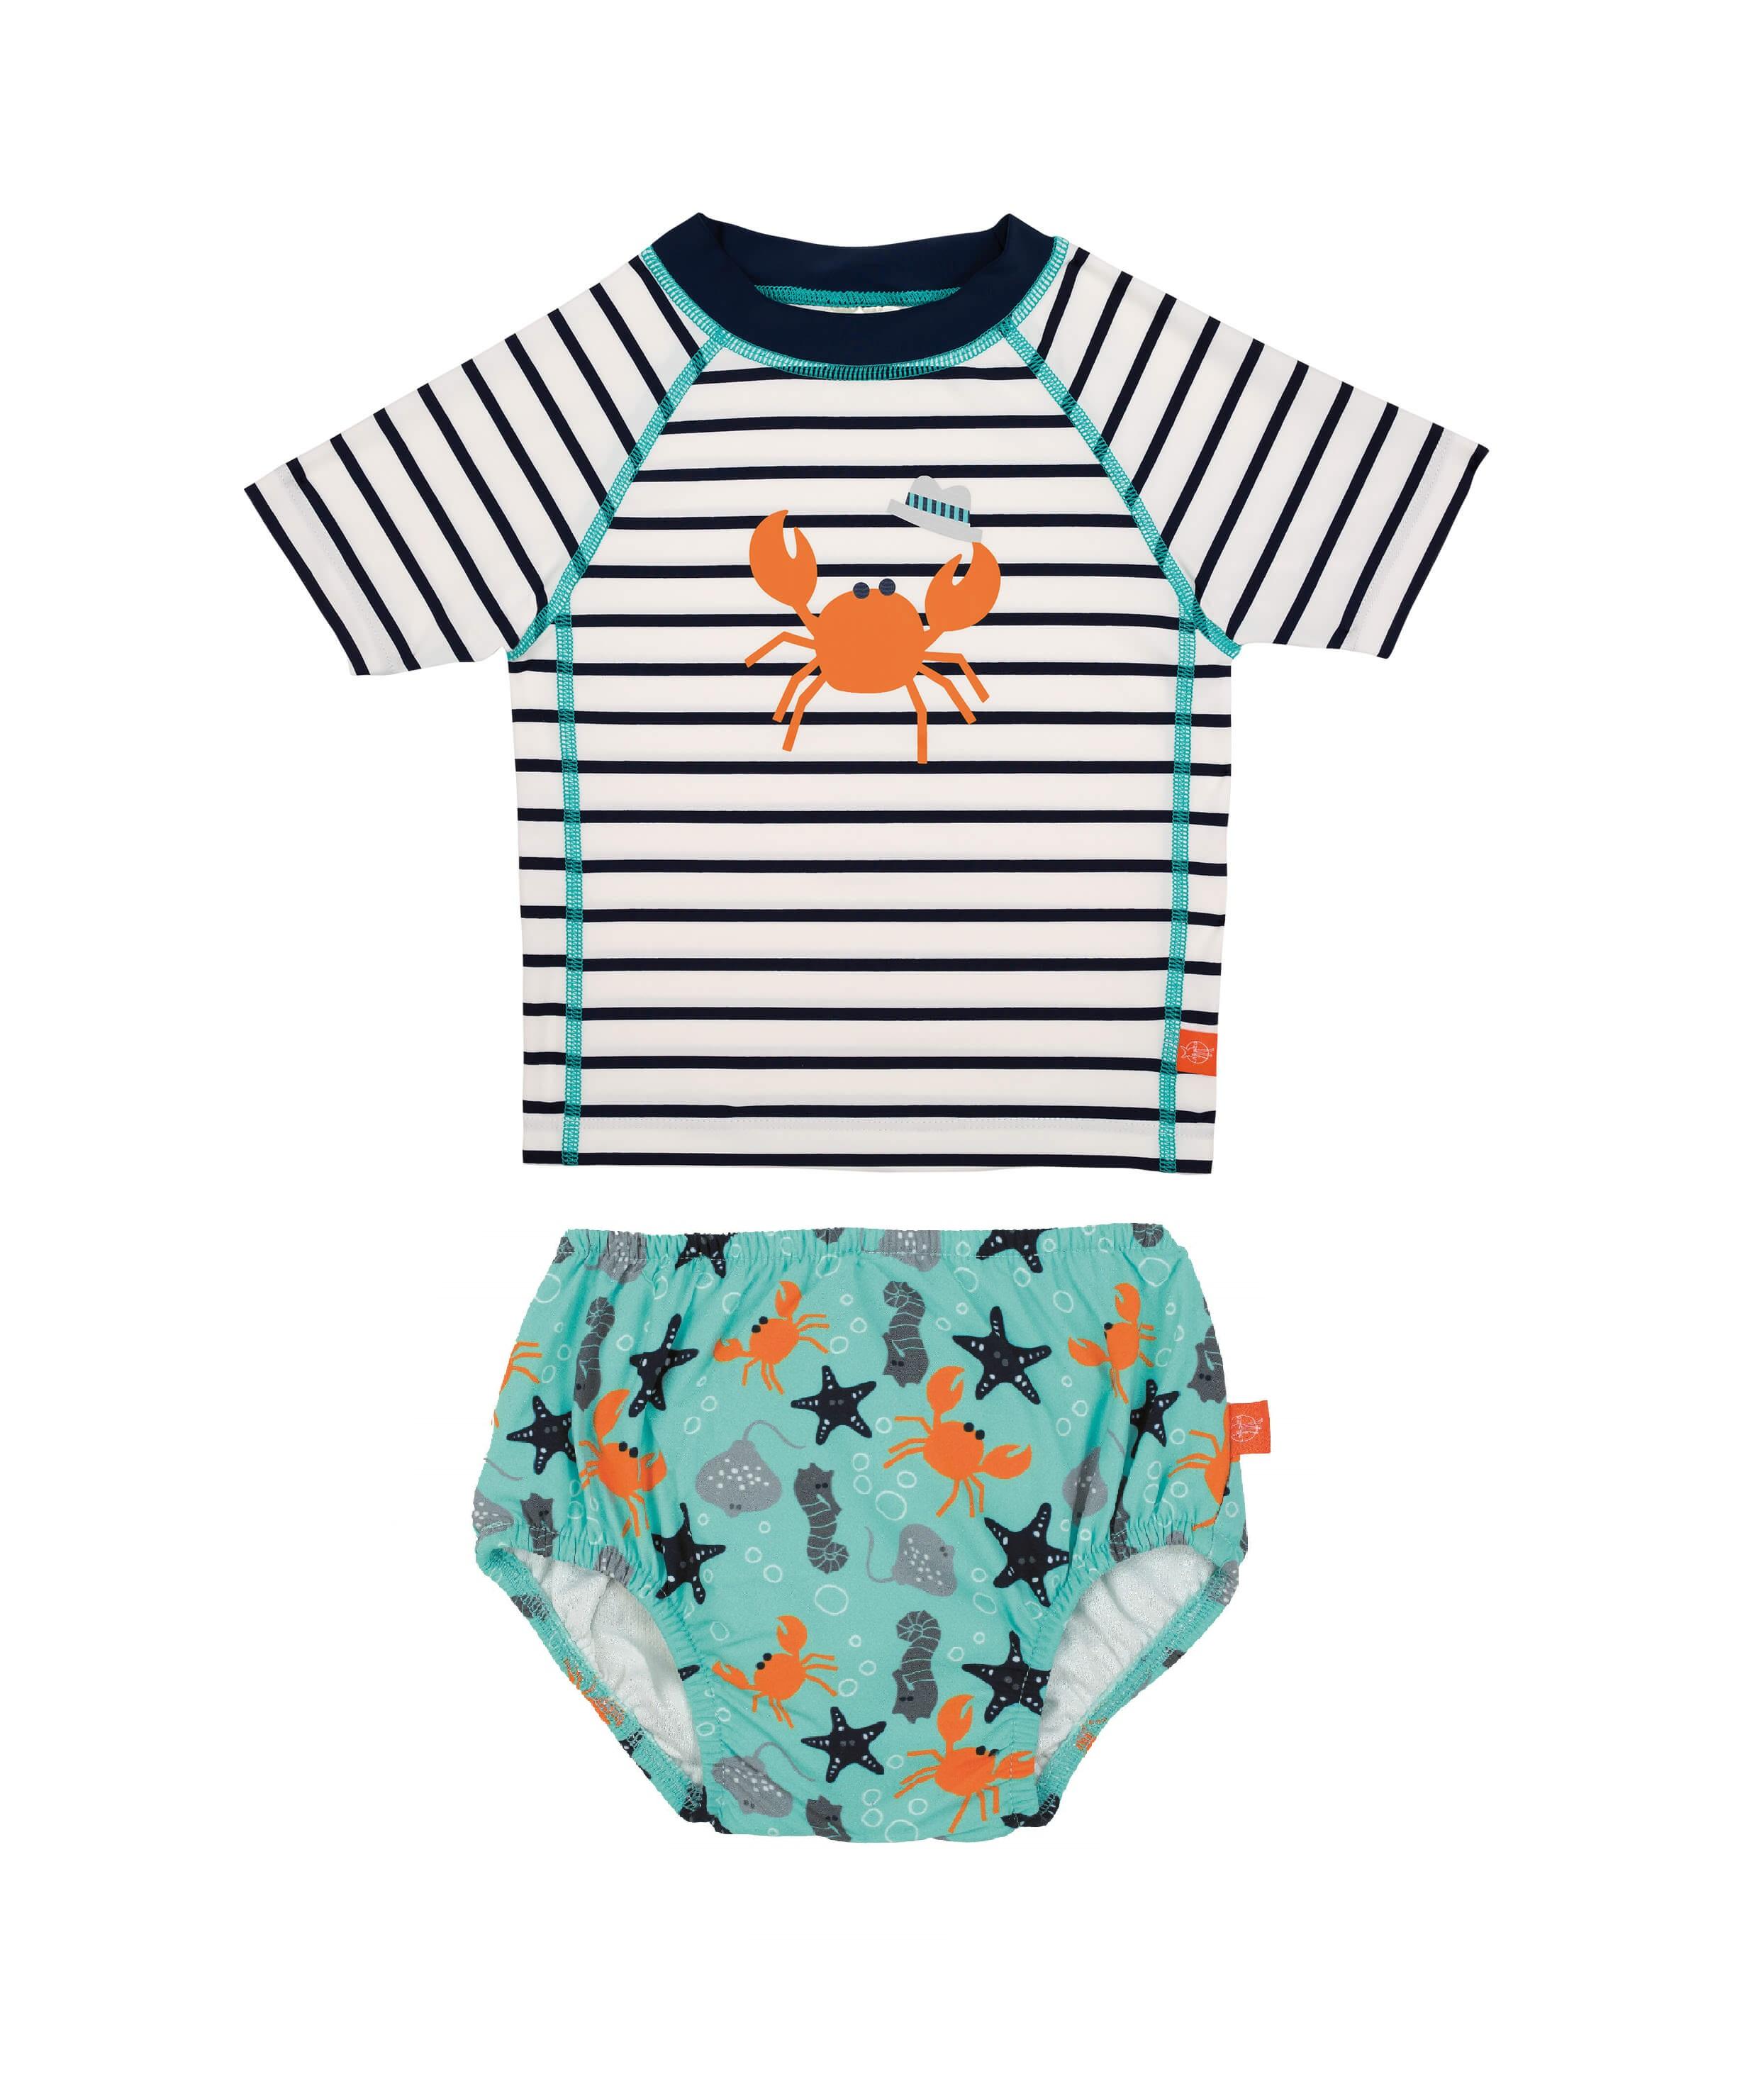 8e8497fef1d Παιδικό μαγιώ - πάνα με Αντιηλιακή Προστασία | Bounitsa.gr